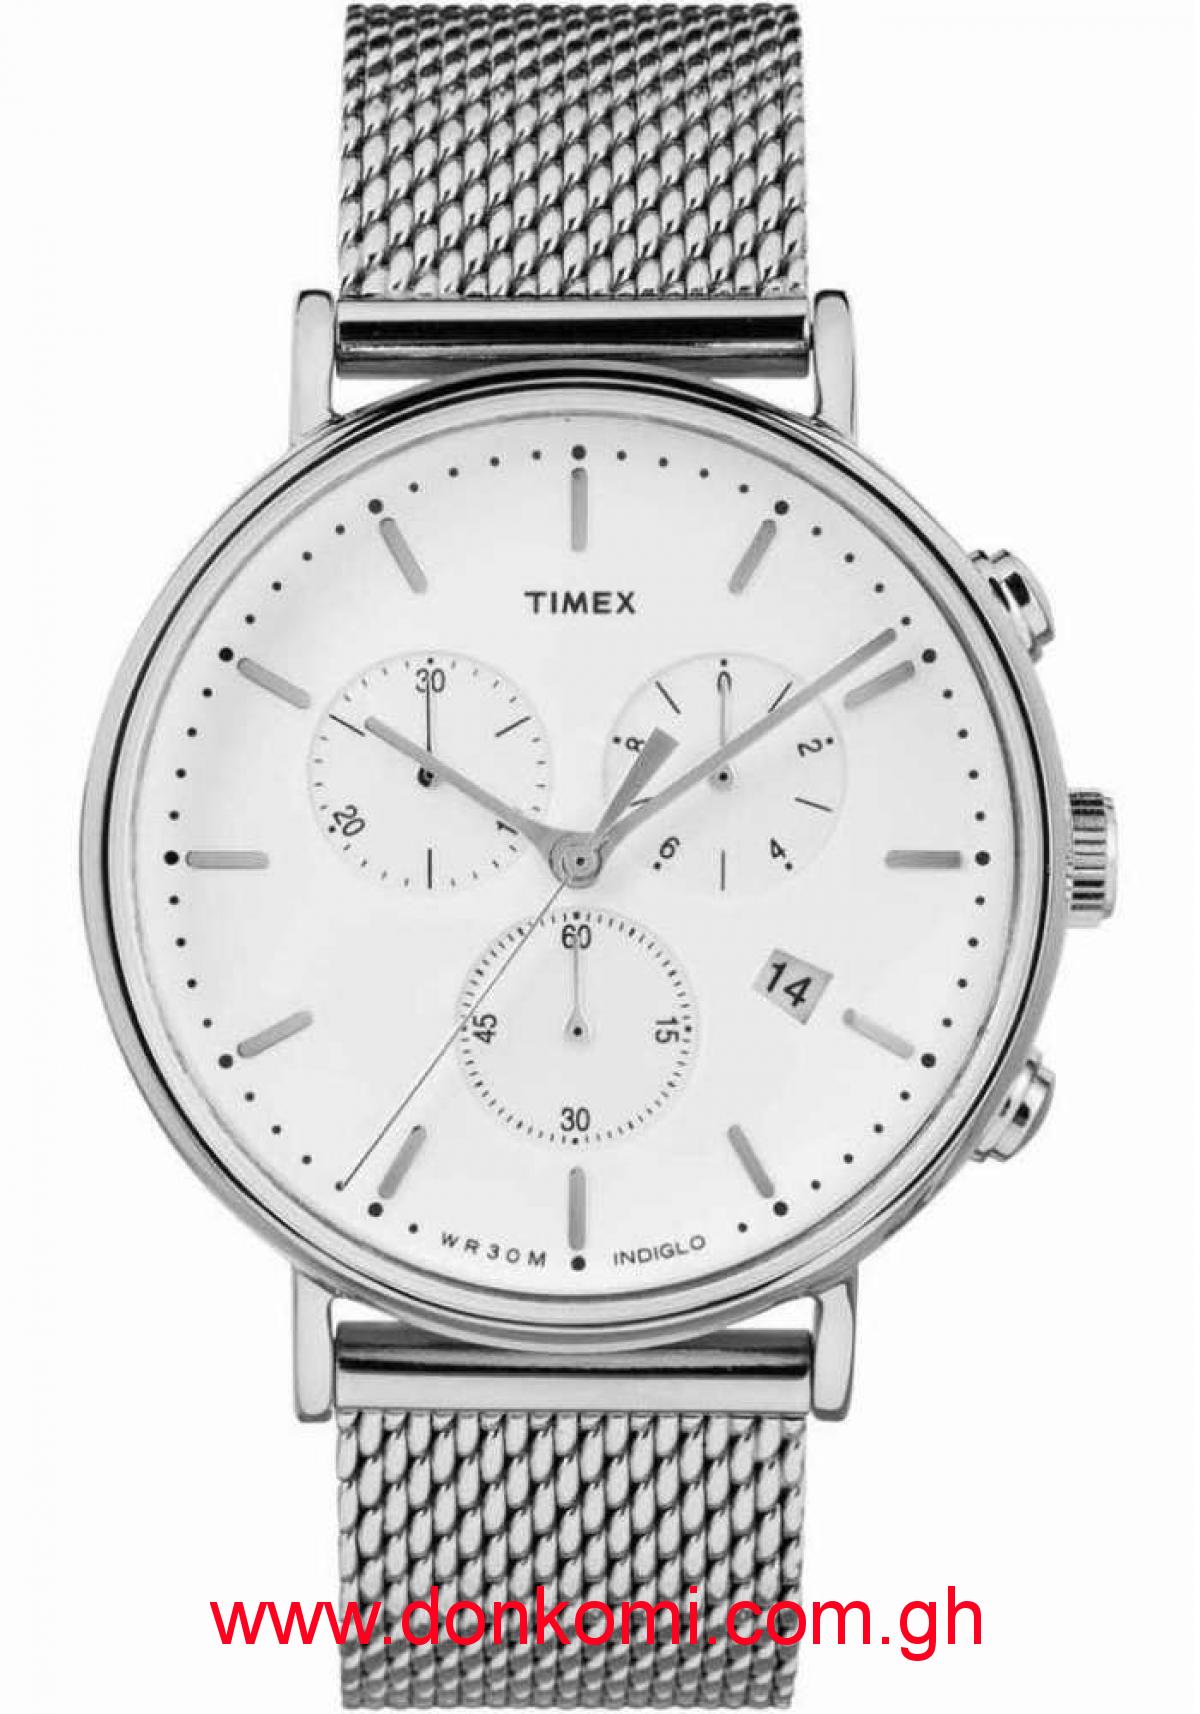 Timex Silver Chain watch